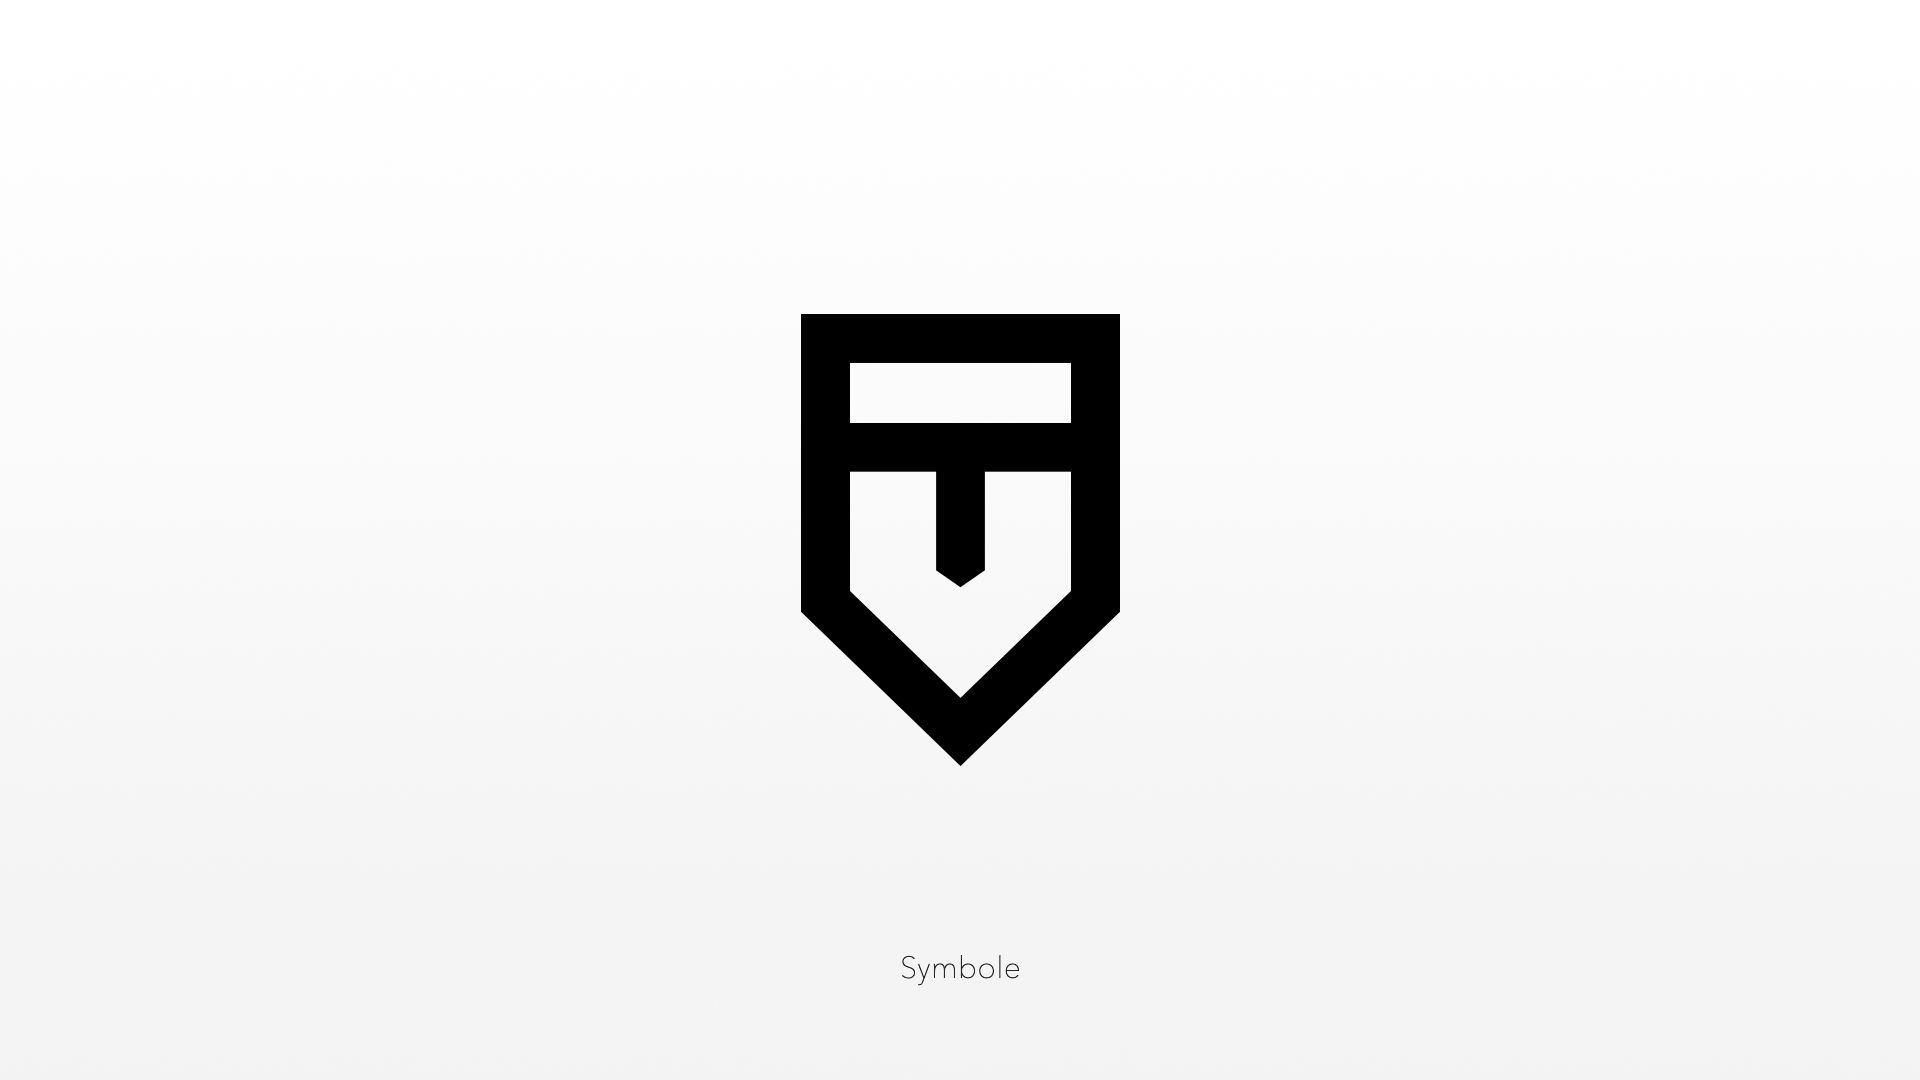 VALINCO_WEB_SYMBOLE.png